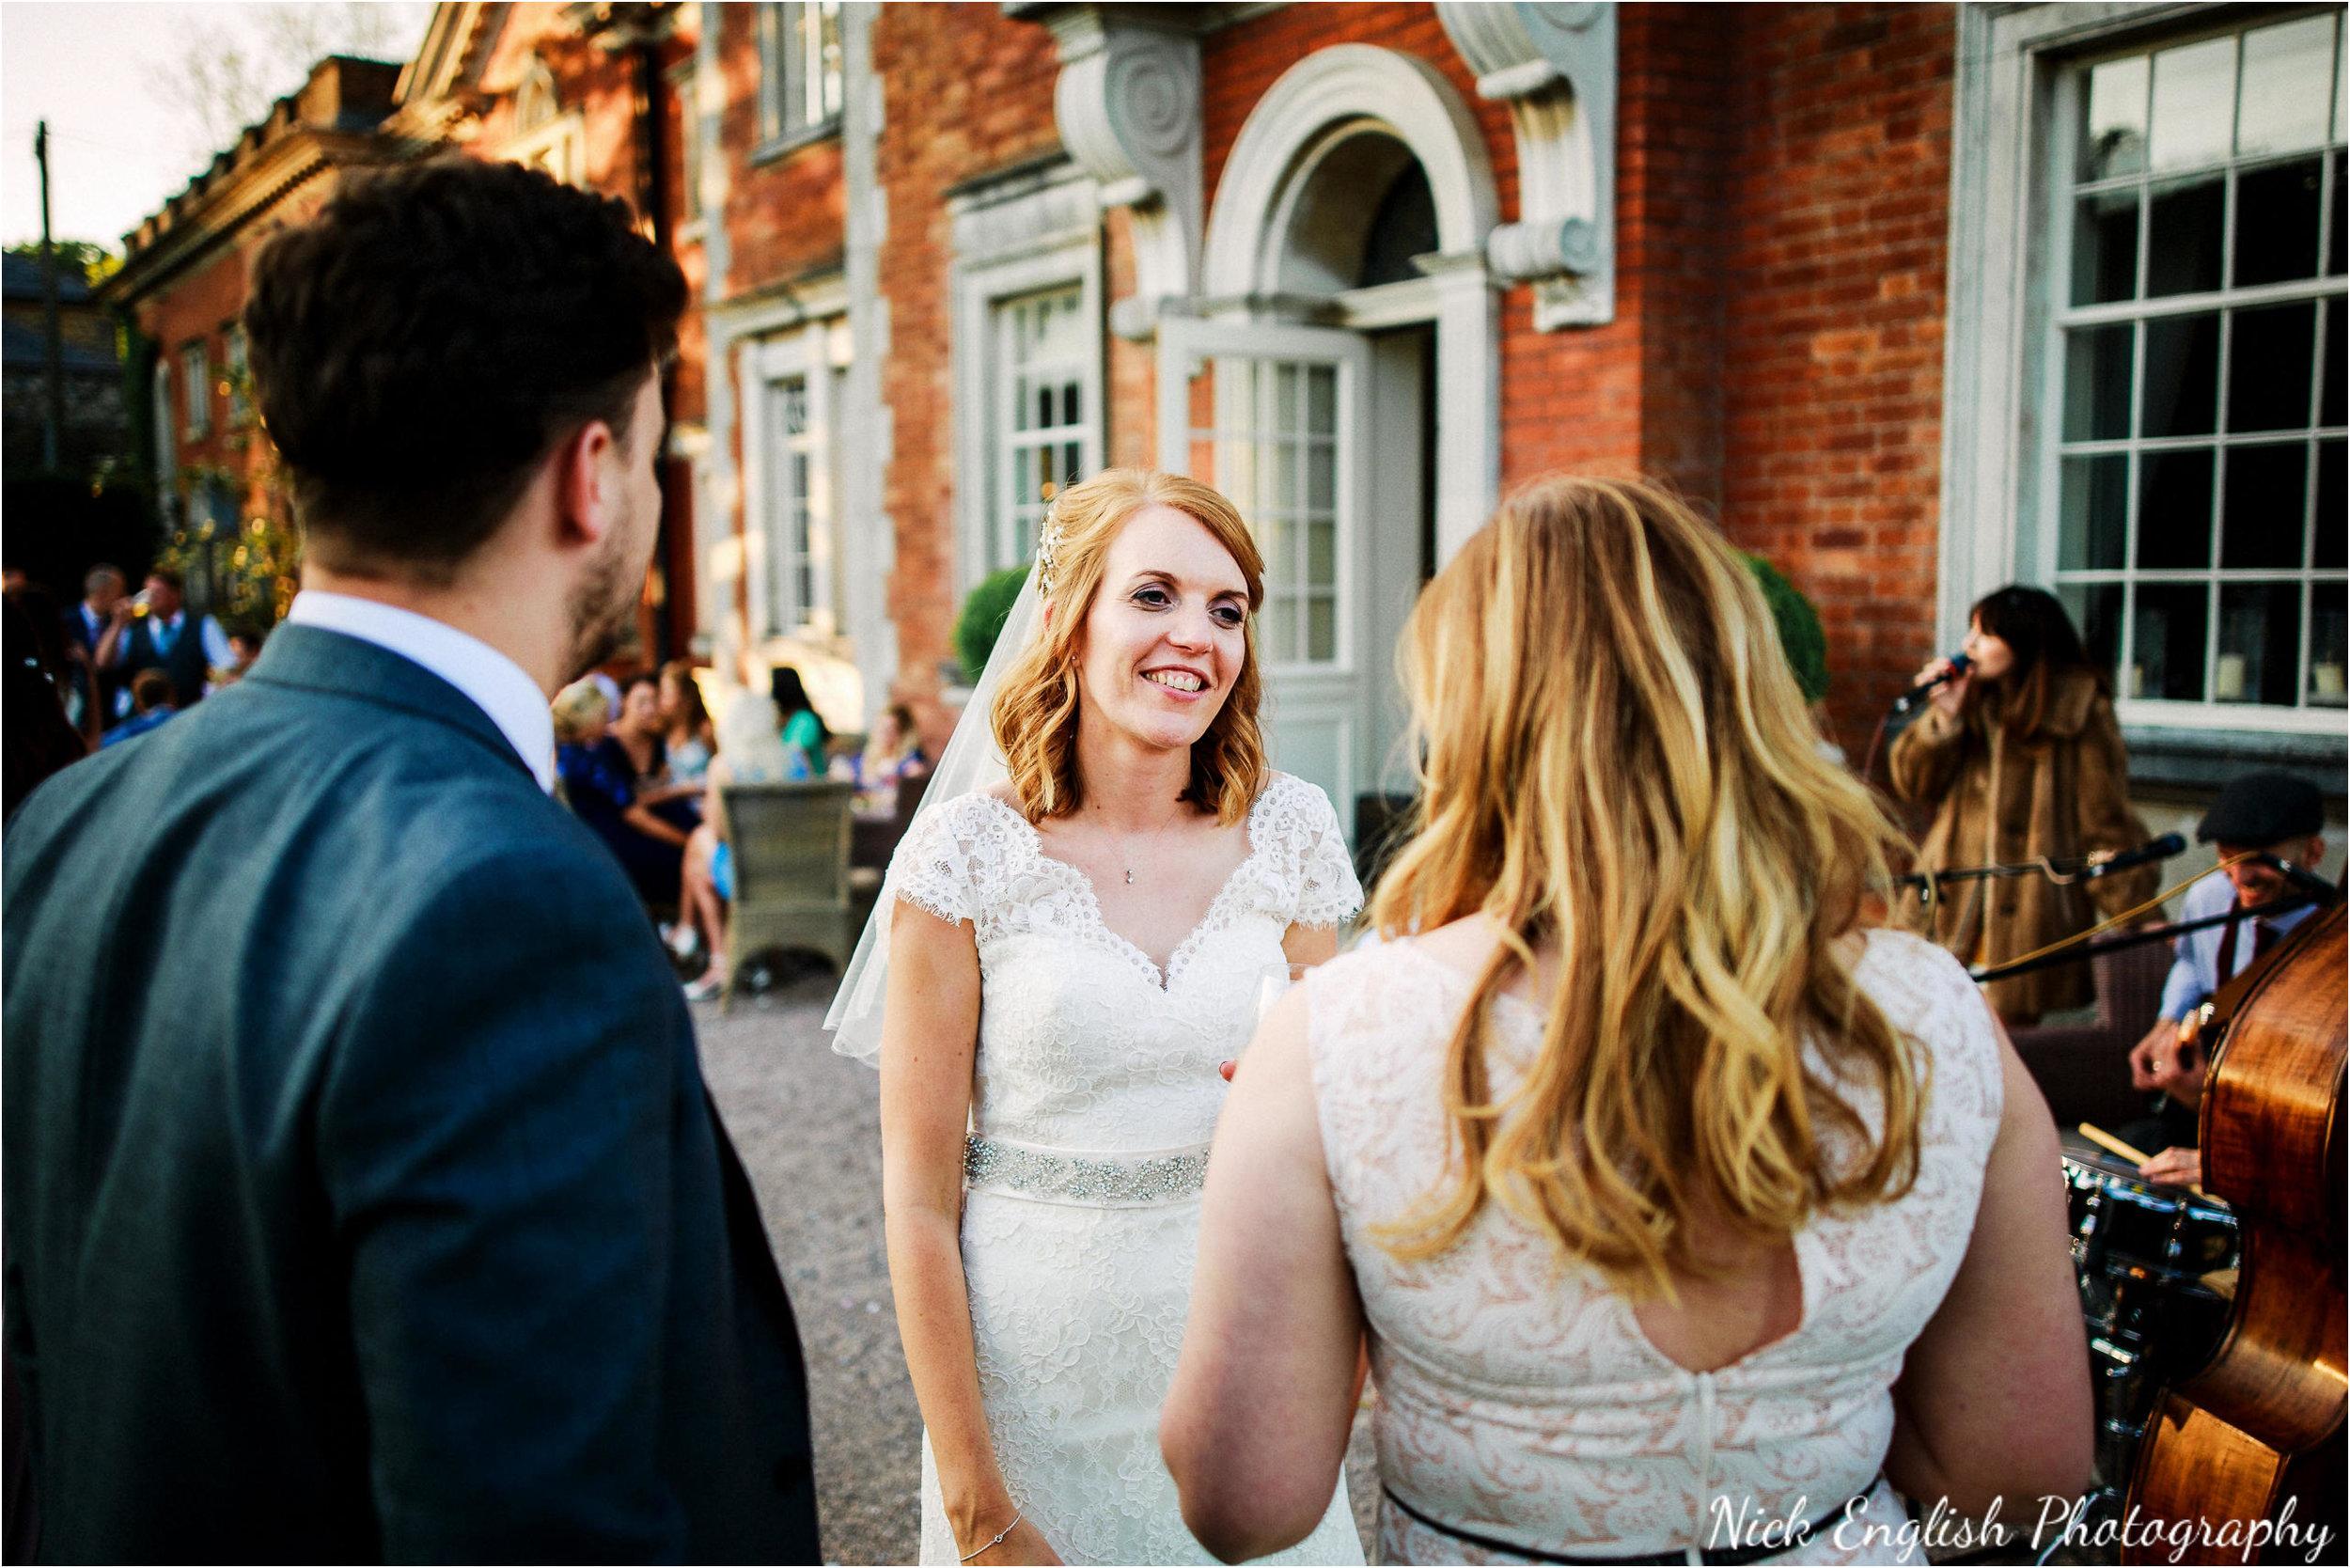 Alison James Wedding Photographs at Eaves Hall West Bradford 224jpg.jpeg